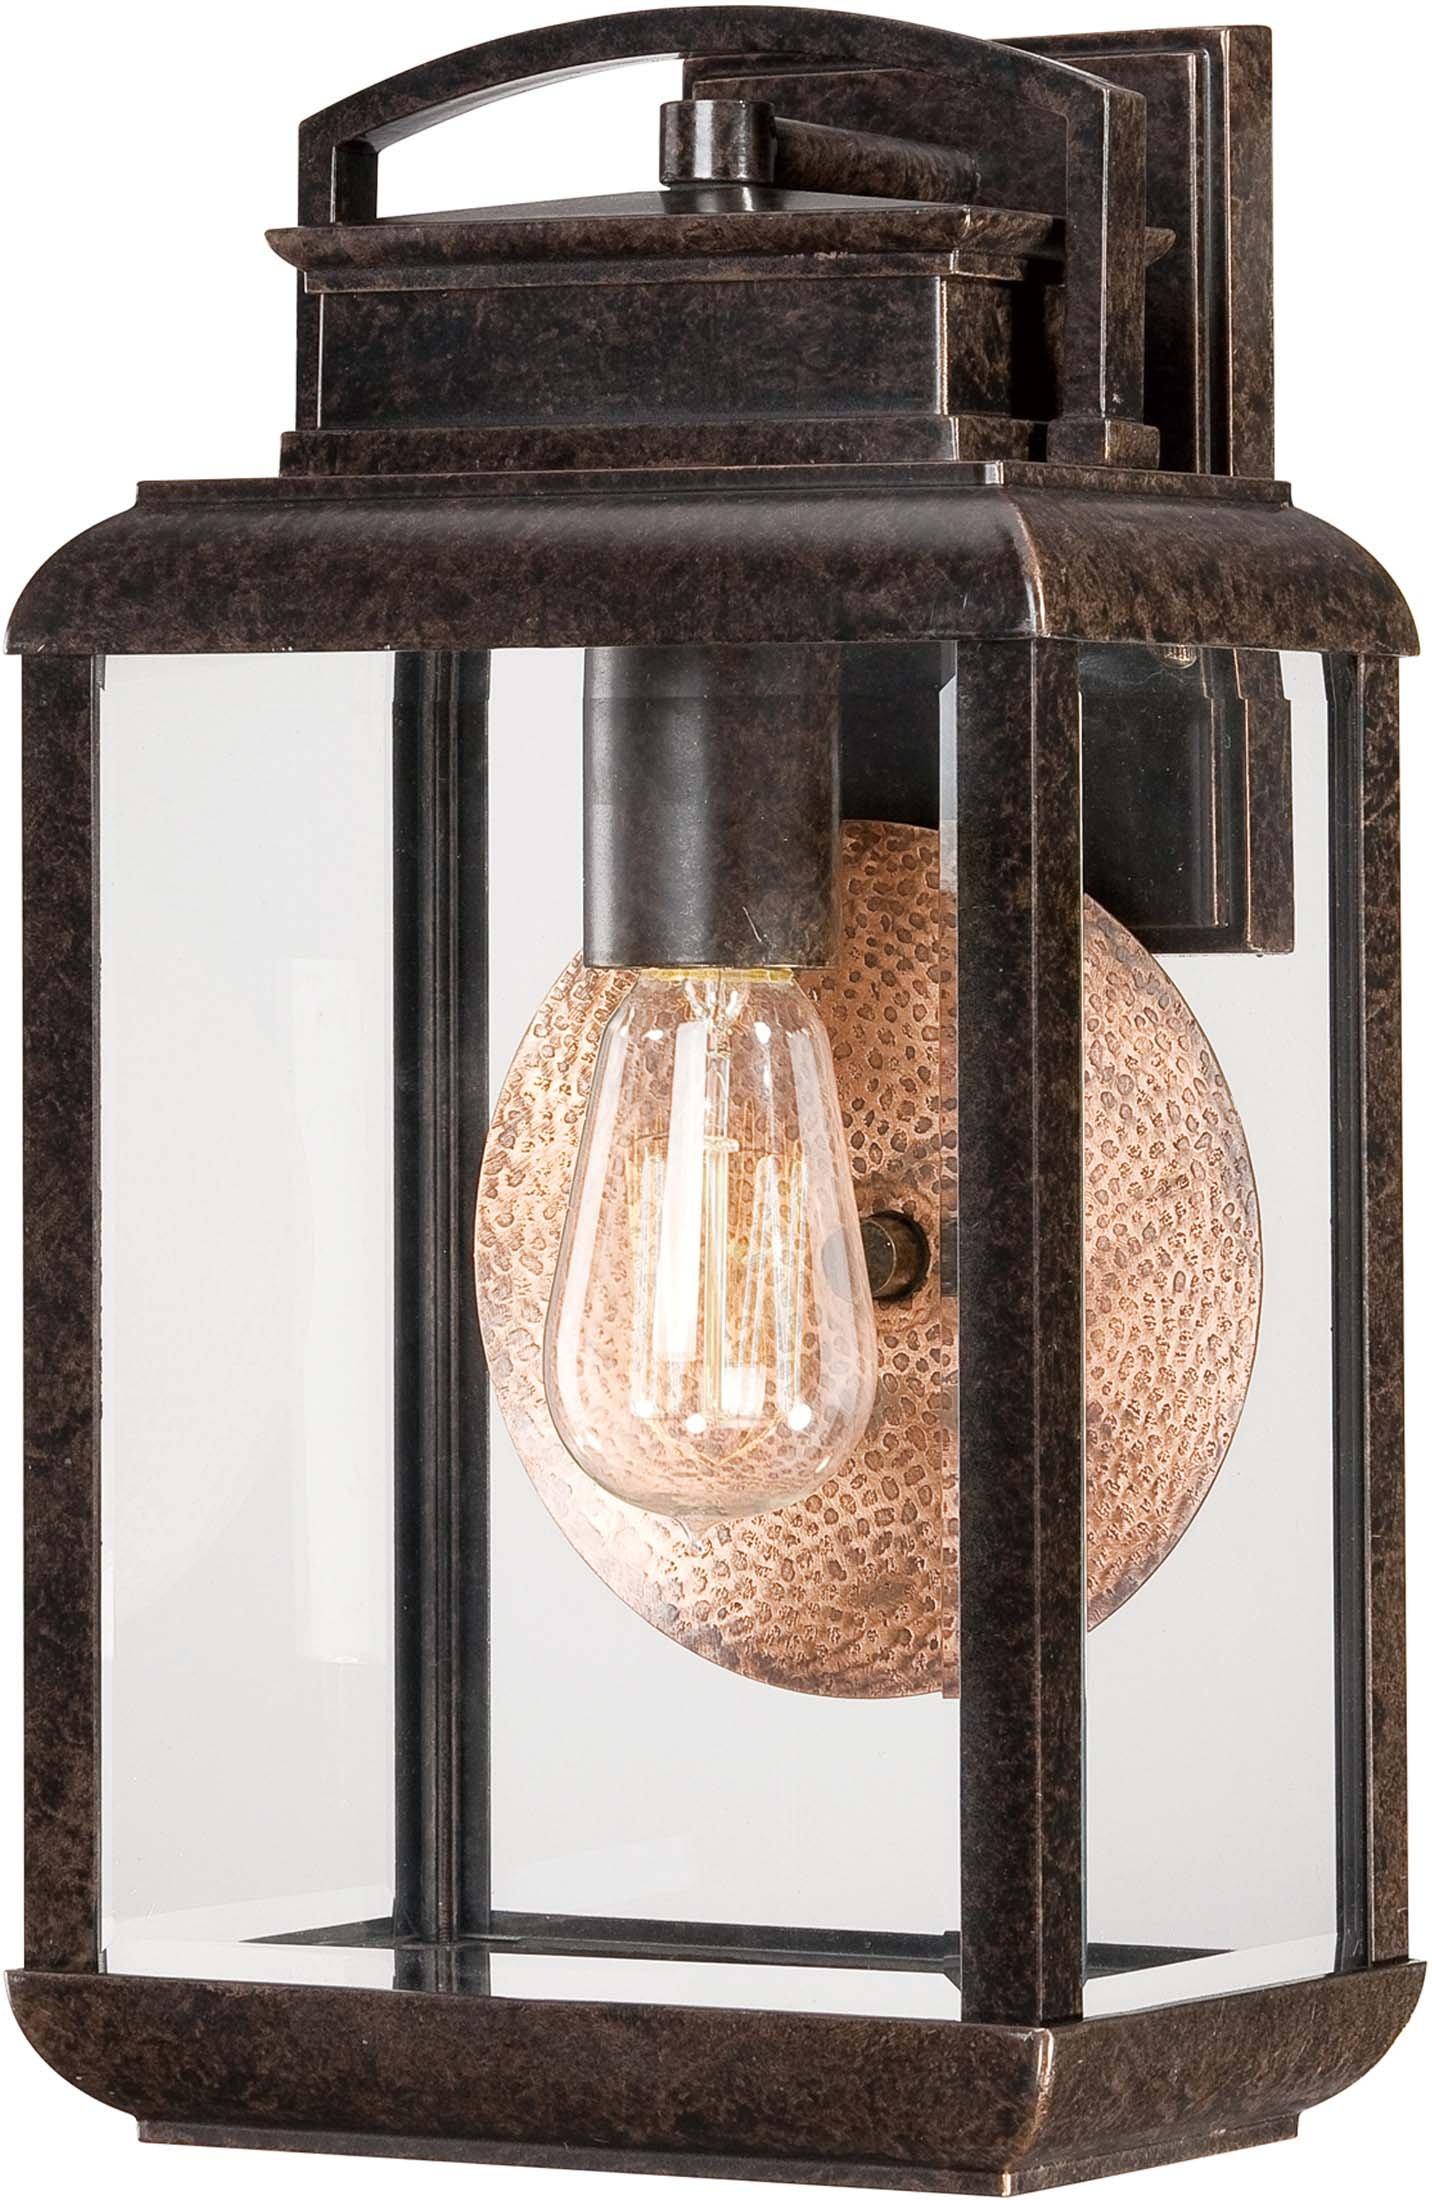 Quoizel BRN8408IB Byron Outdoor Farmhouse Lantern Wall Sconce, 1-Light, 100 Watts, Imperial Bronze (15'' H x 8'' W)